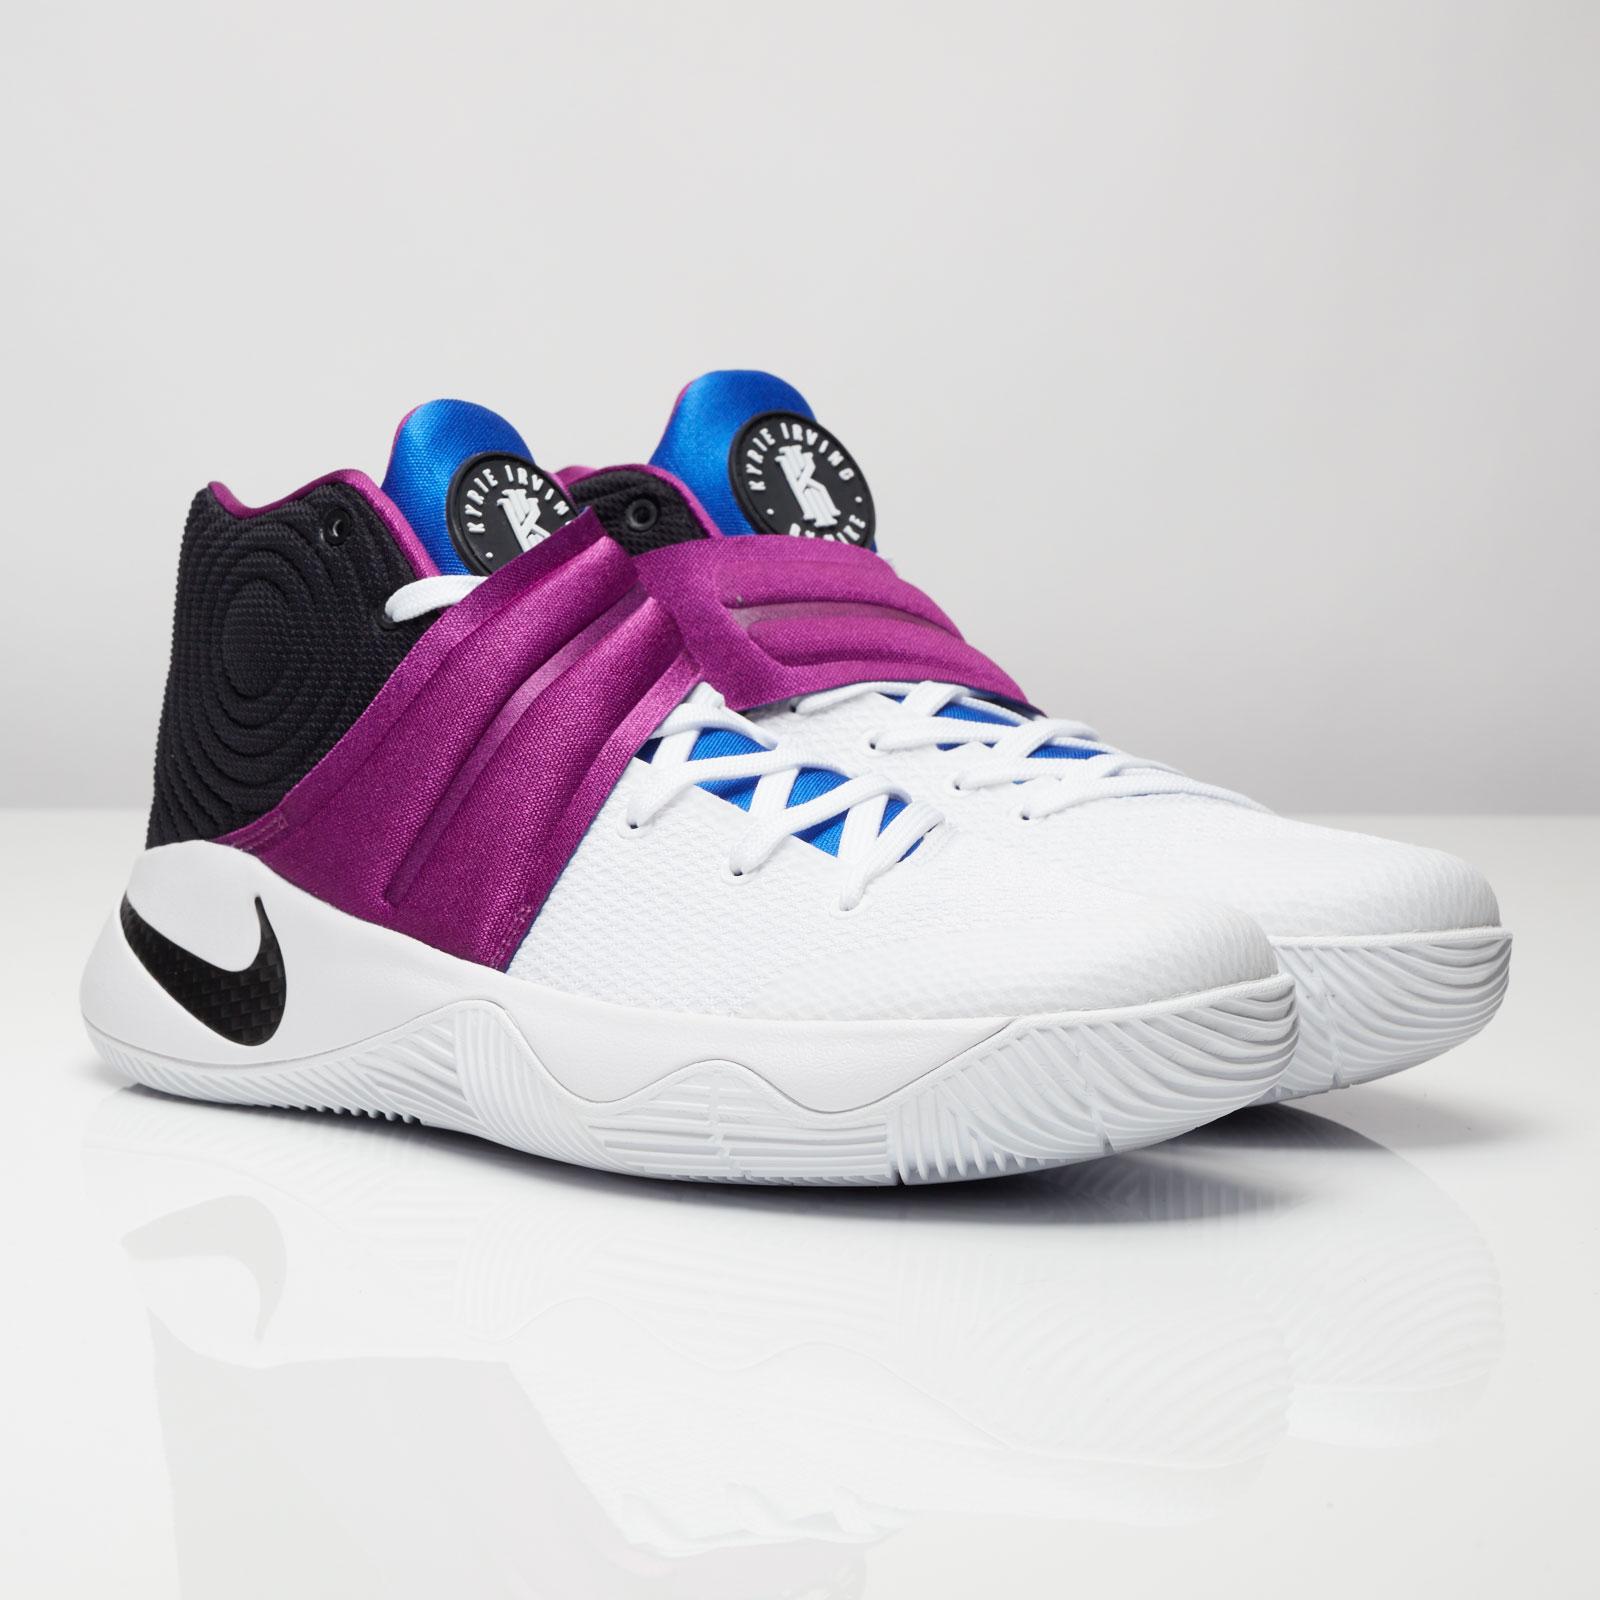 0a6d67e84543 Nike Kyrie 2 - 819583-104 - Sneakersnstuff